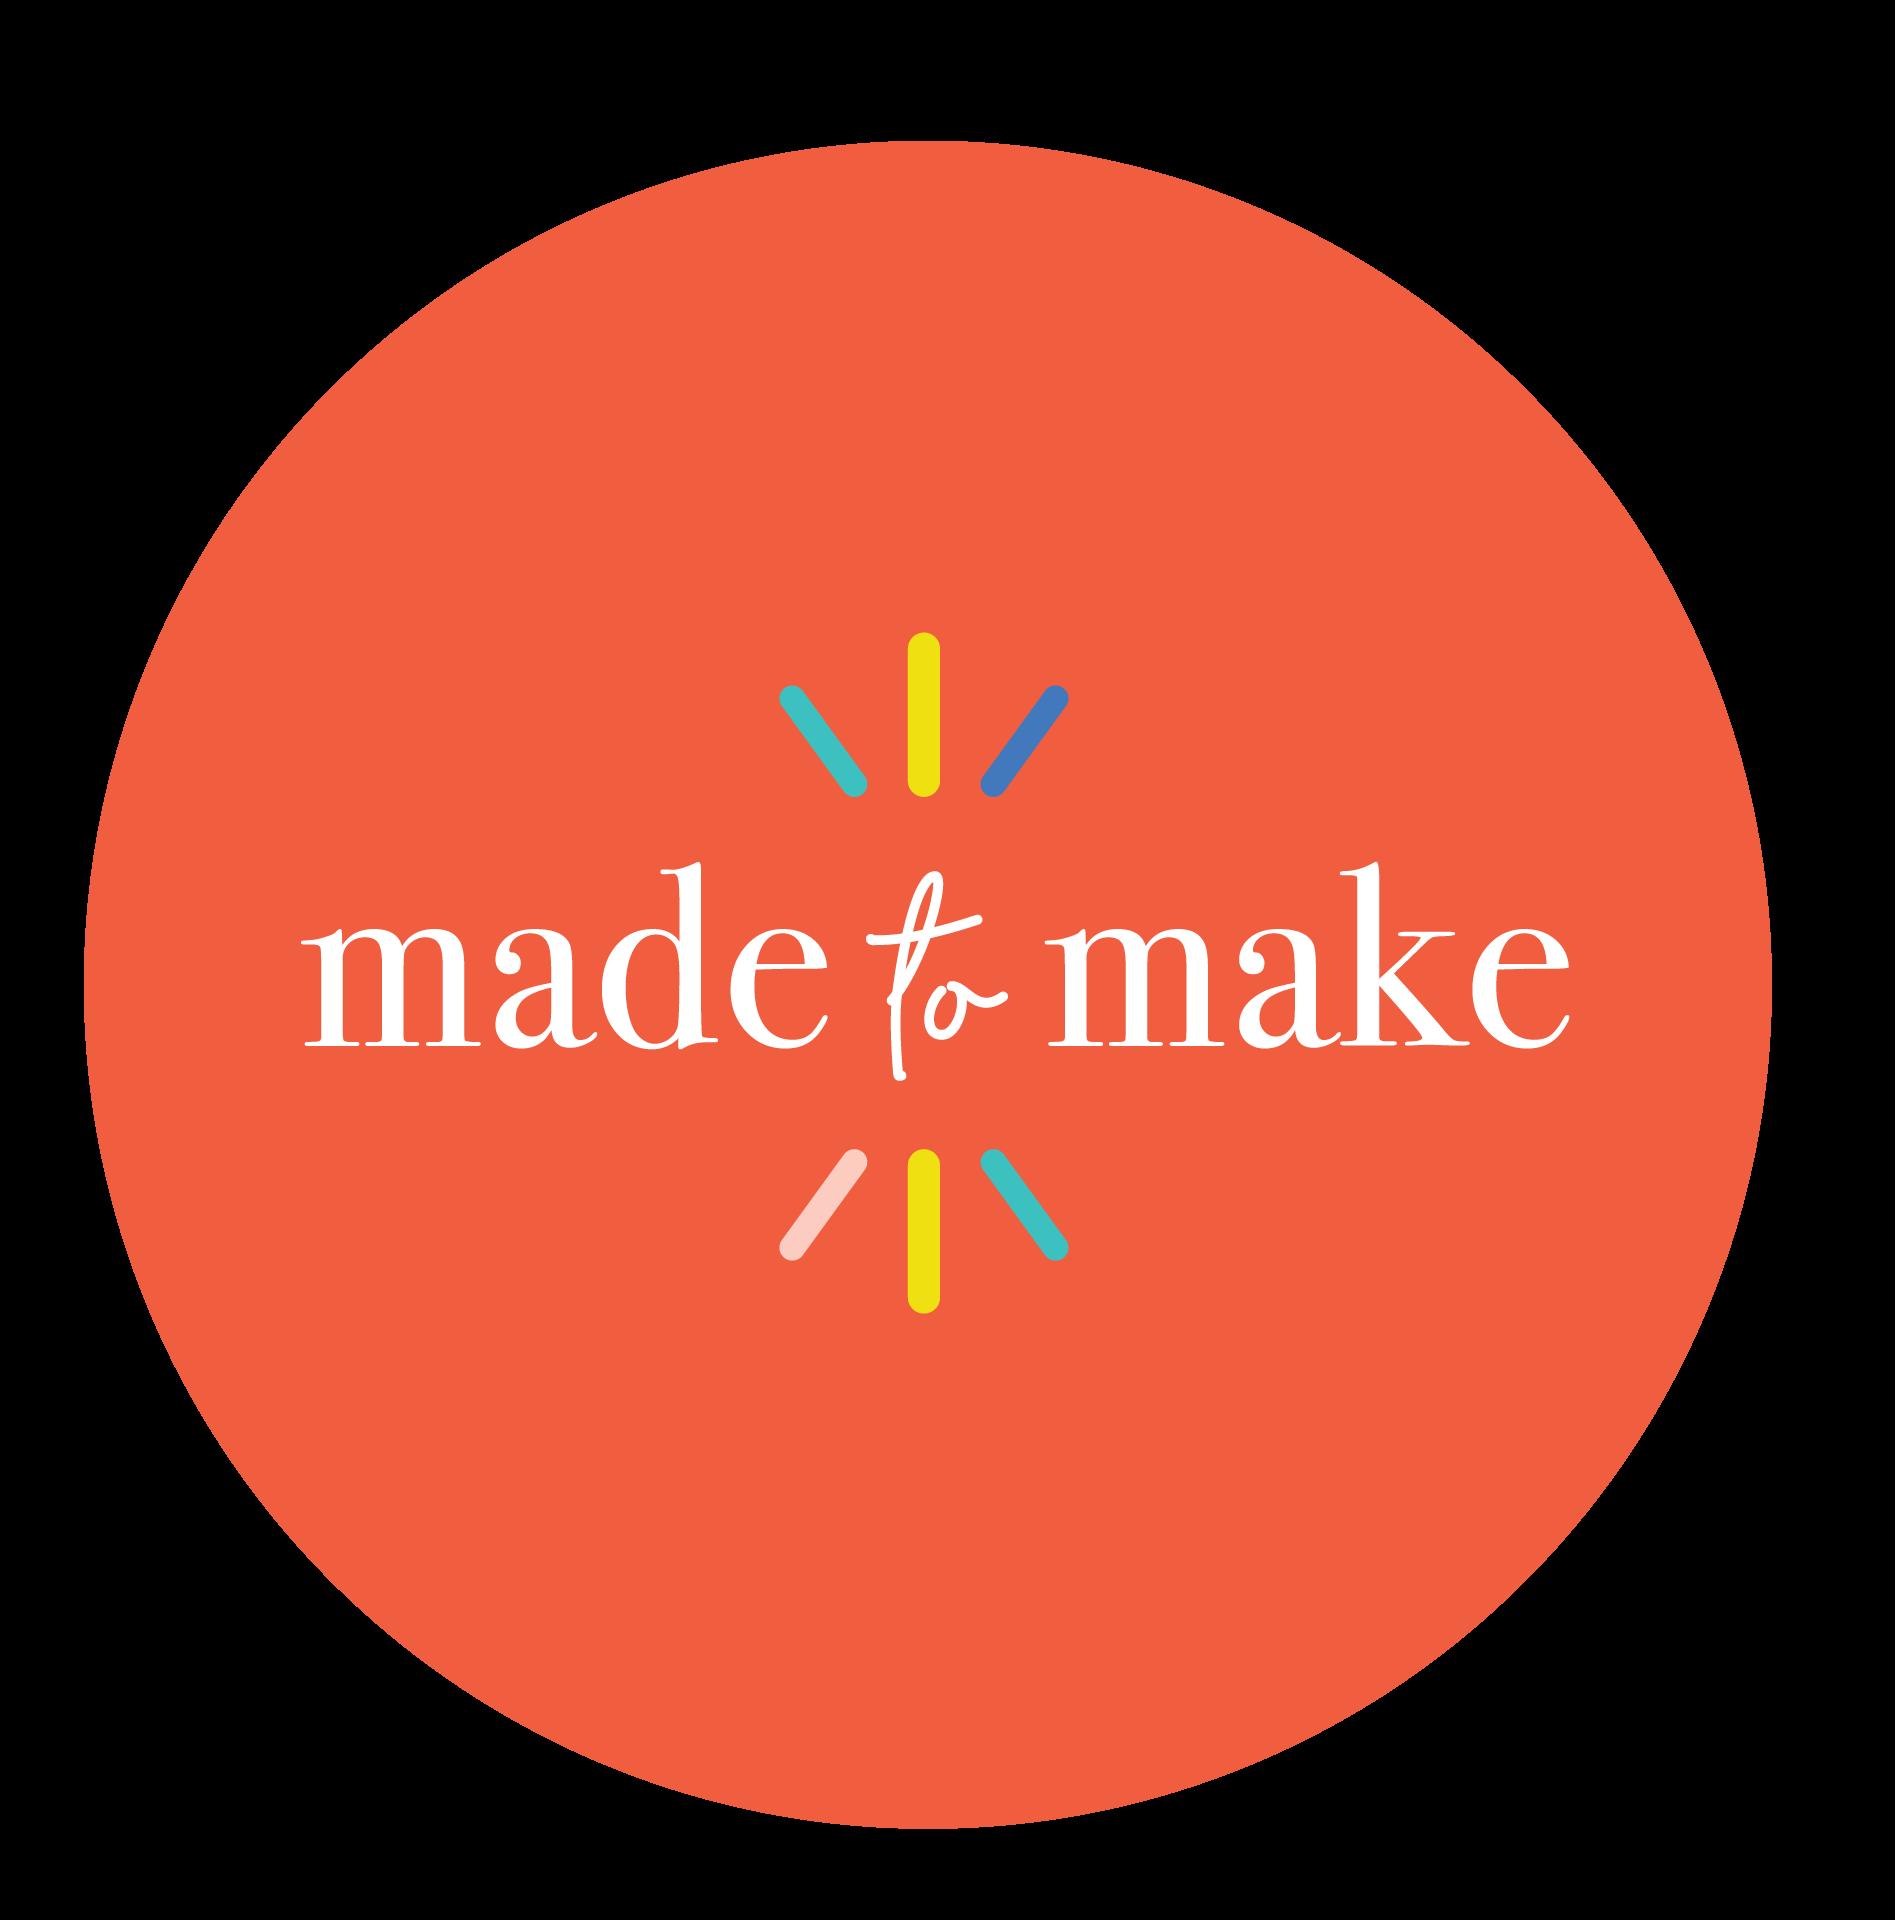 Made-to-make2.png